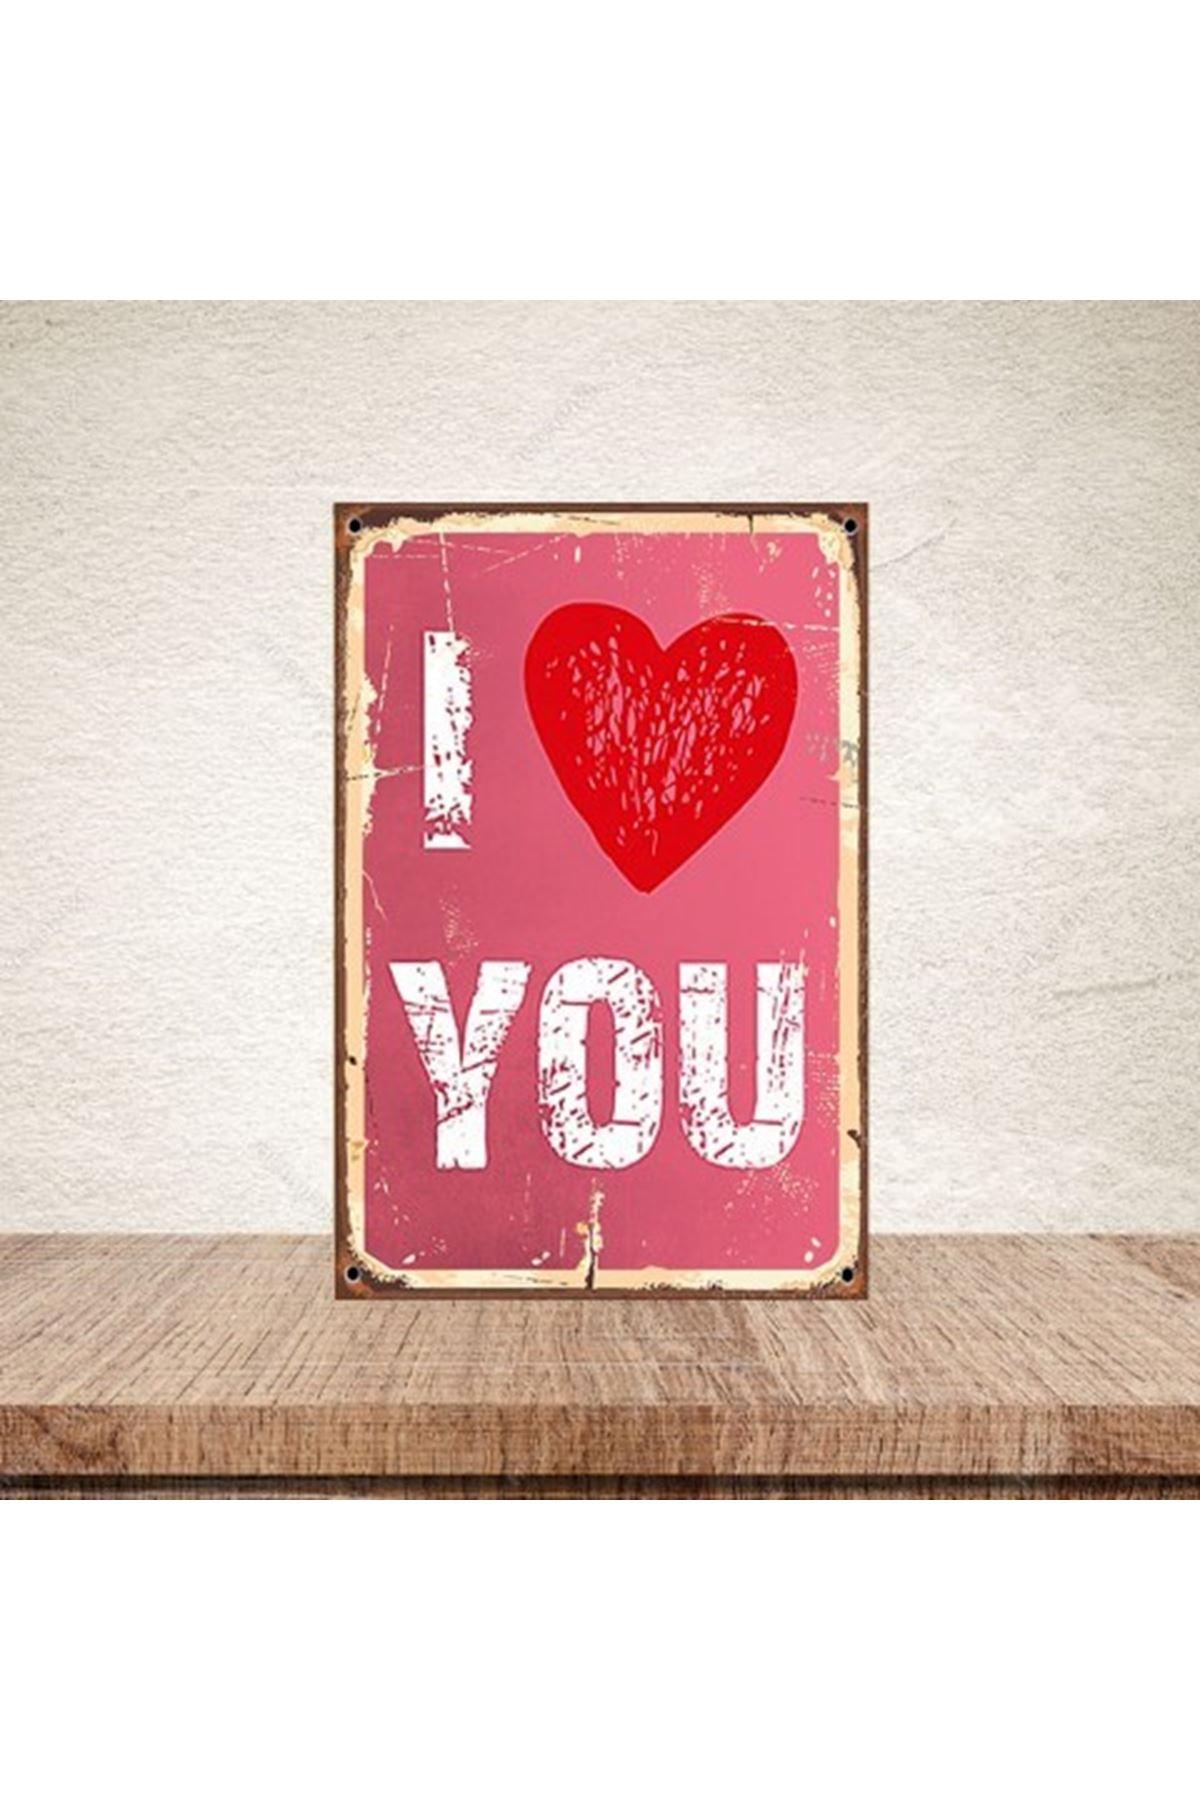 I LOVE YOU - AHŞAP POSTER